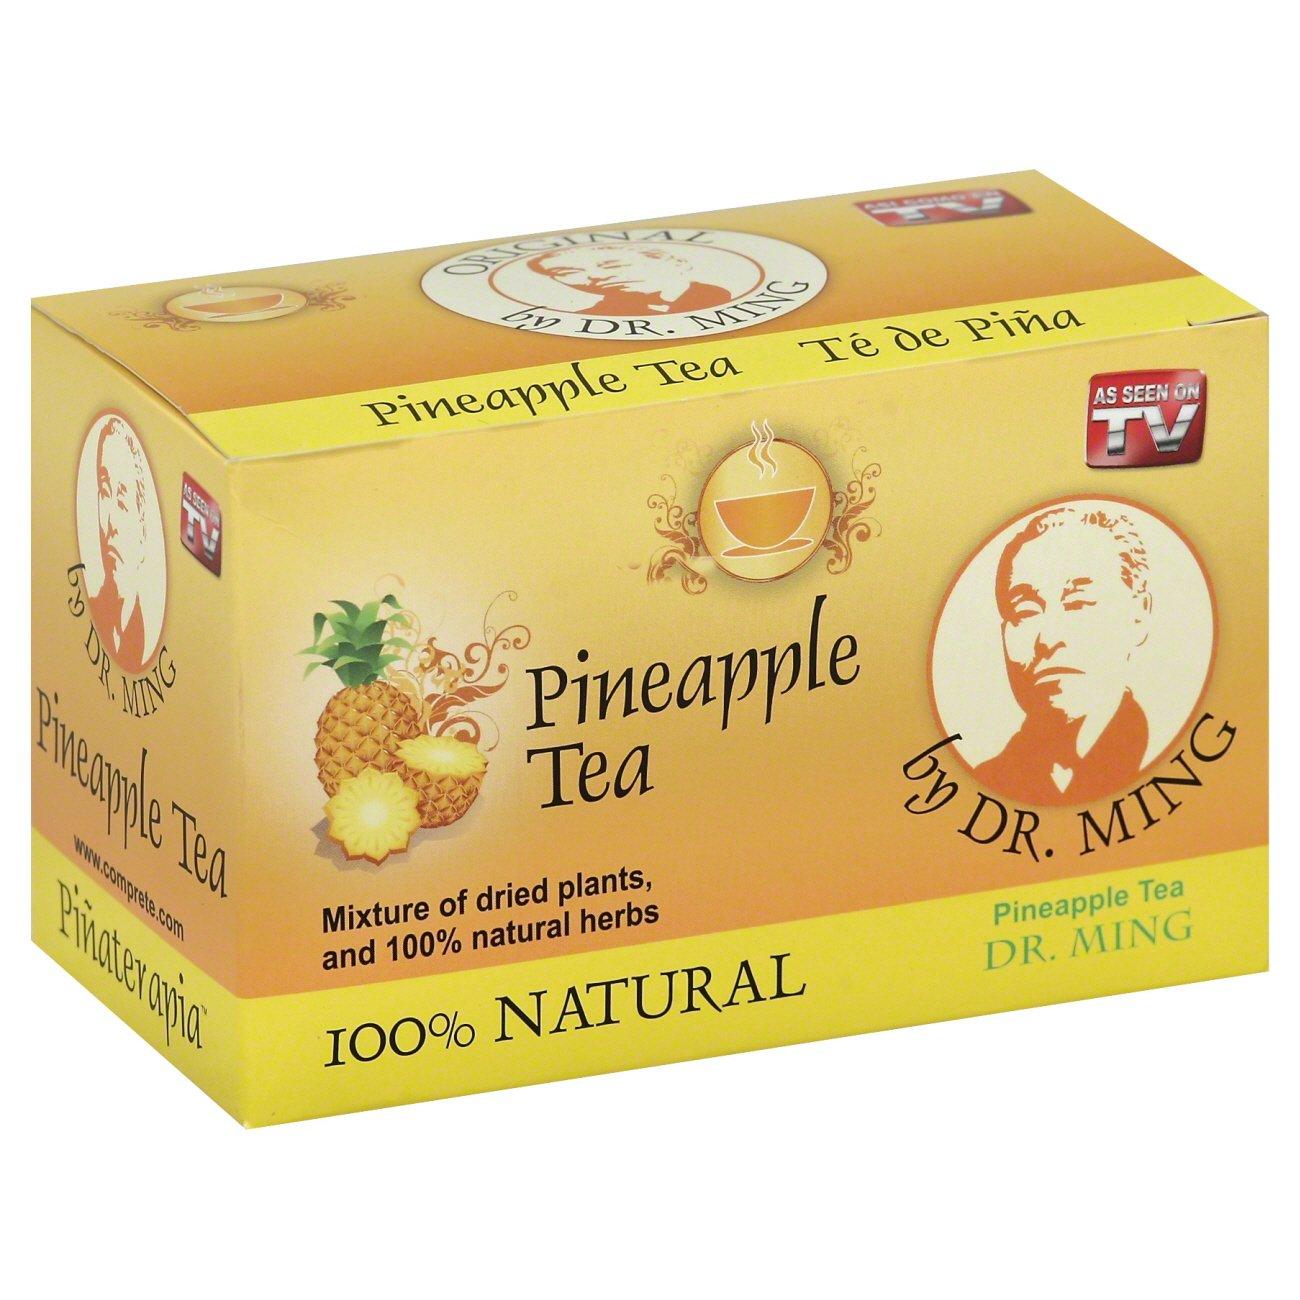 Dr Ming Te De Pina Pineapple Tea - Shop Tea at H-E-B